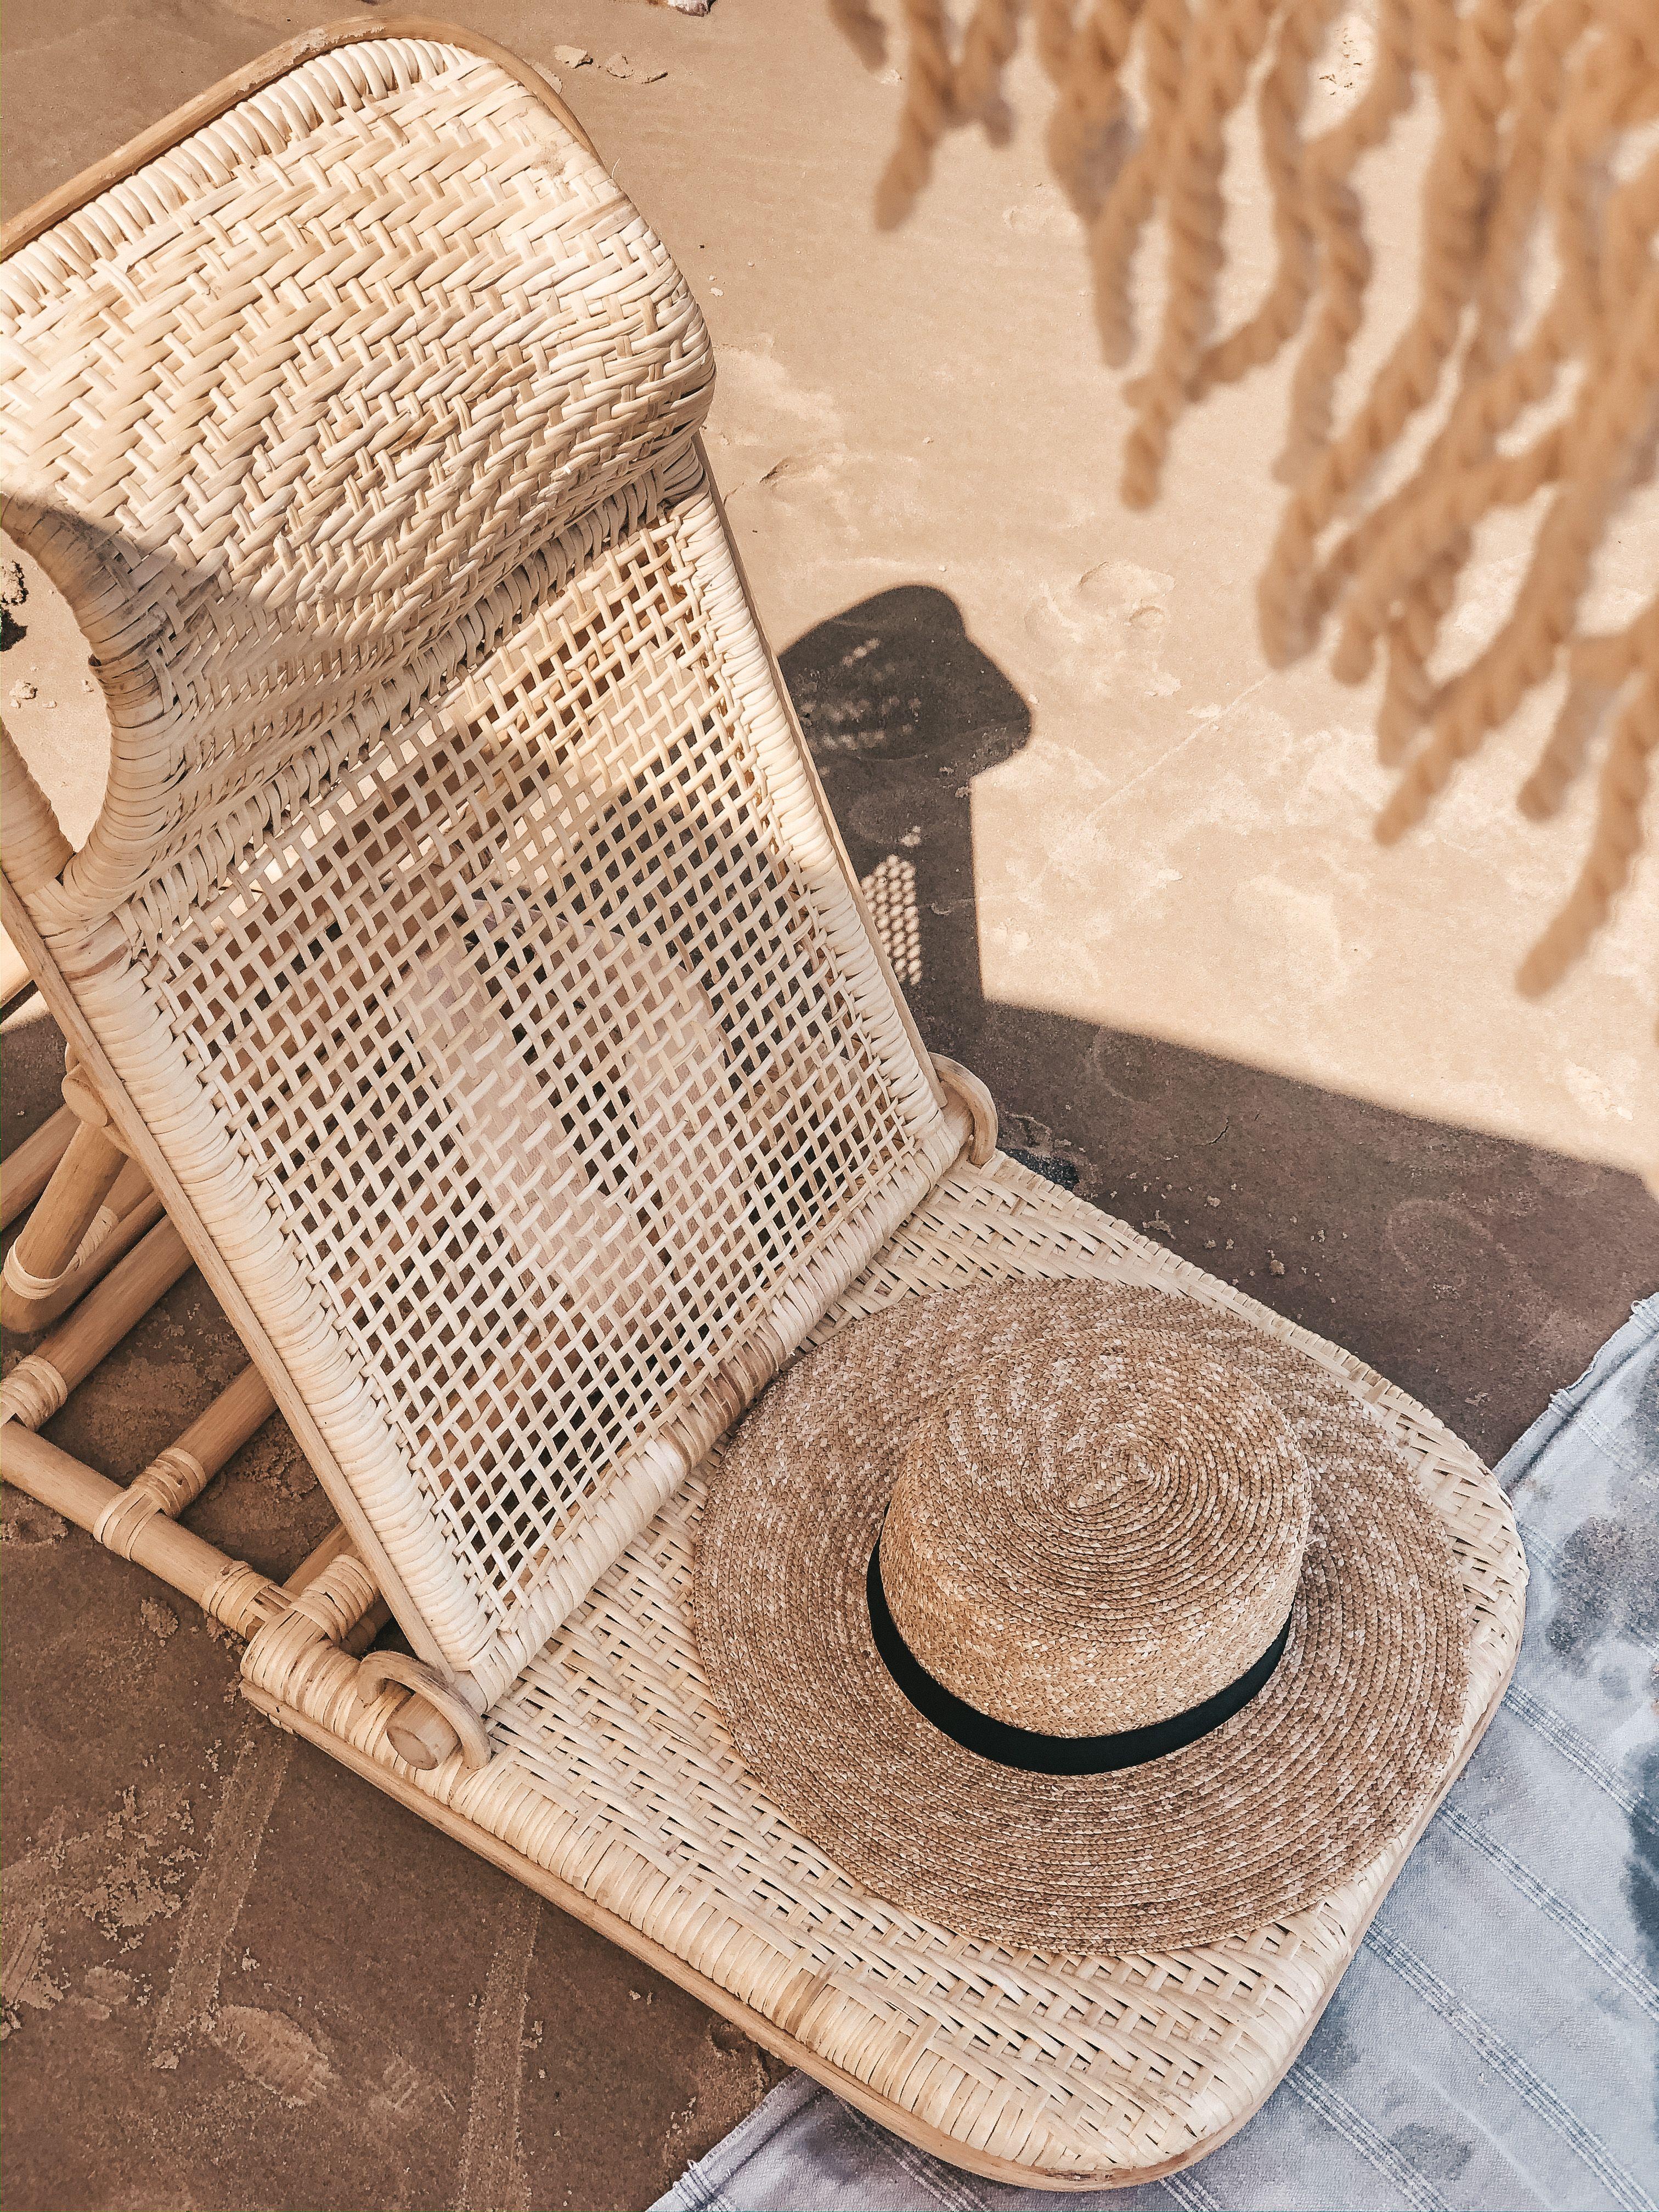 Rattan Beach Chair in 2020 Rattan beach chair, Beach